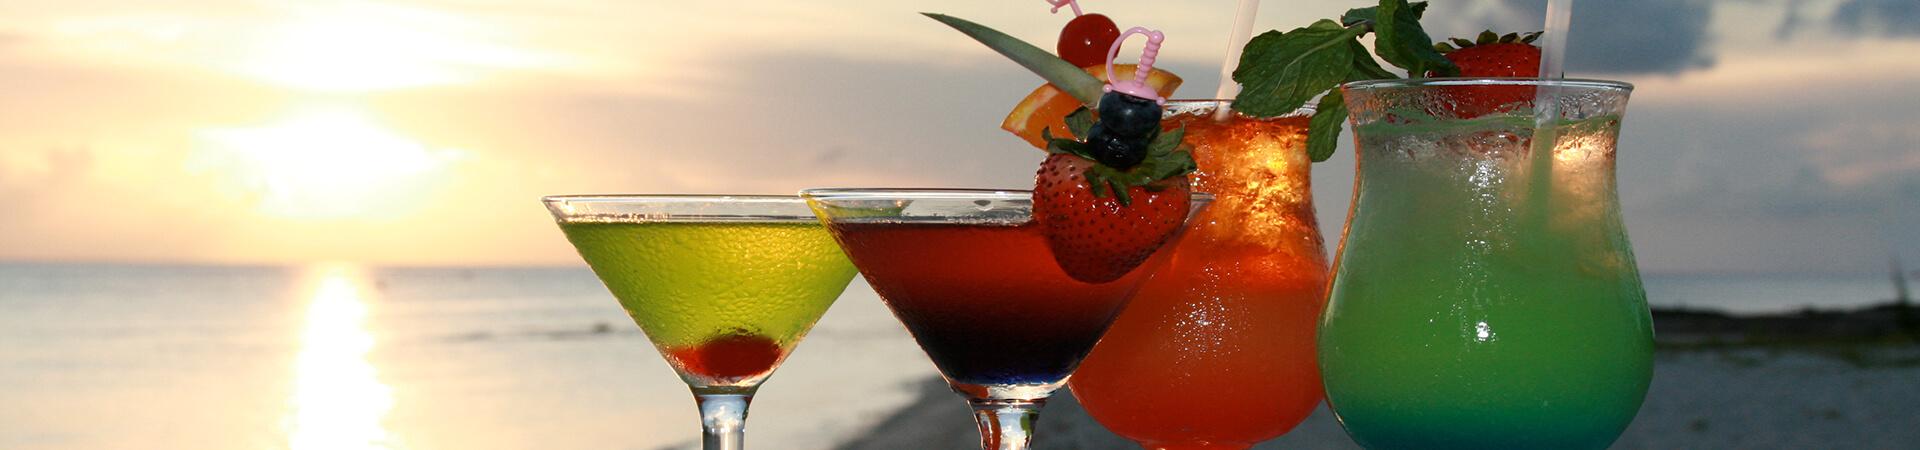 Cocktails Menu Banner - The Wharf Restaurant & Bar